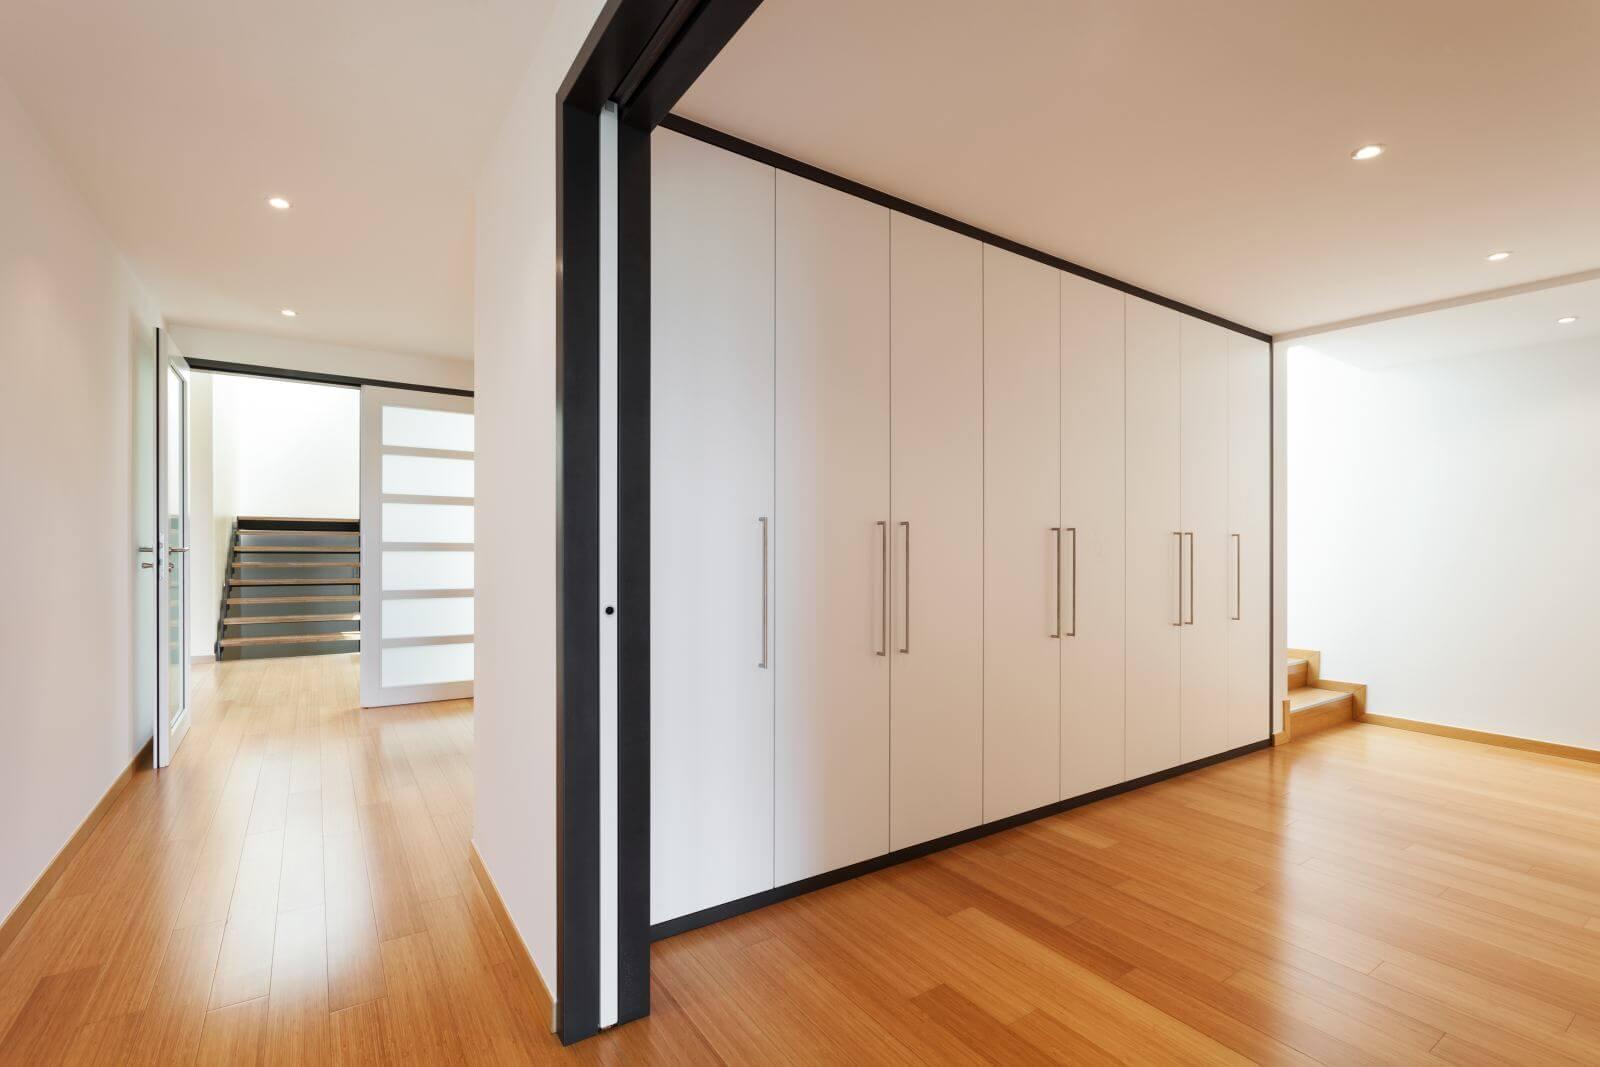 interior of a modern house, long corridor with wardrobes